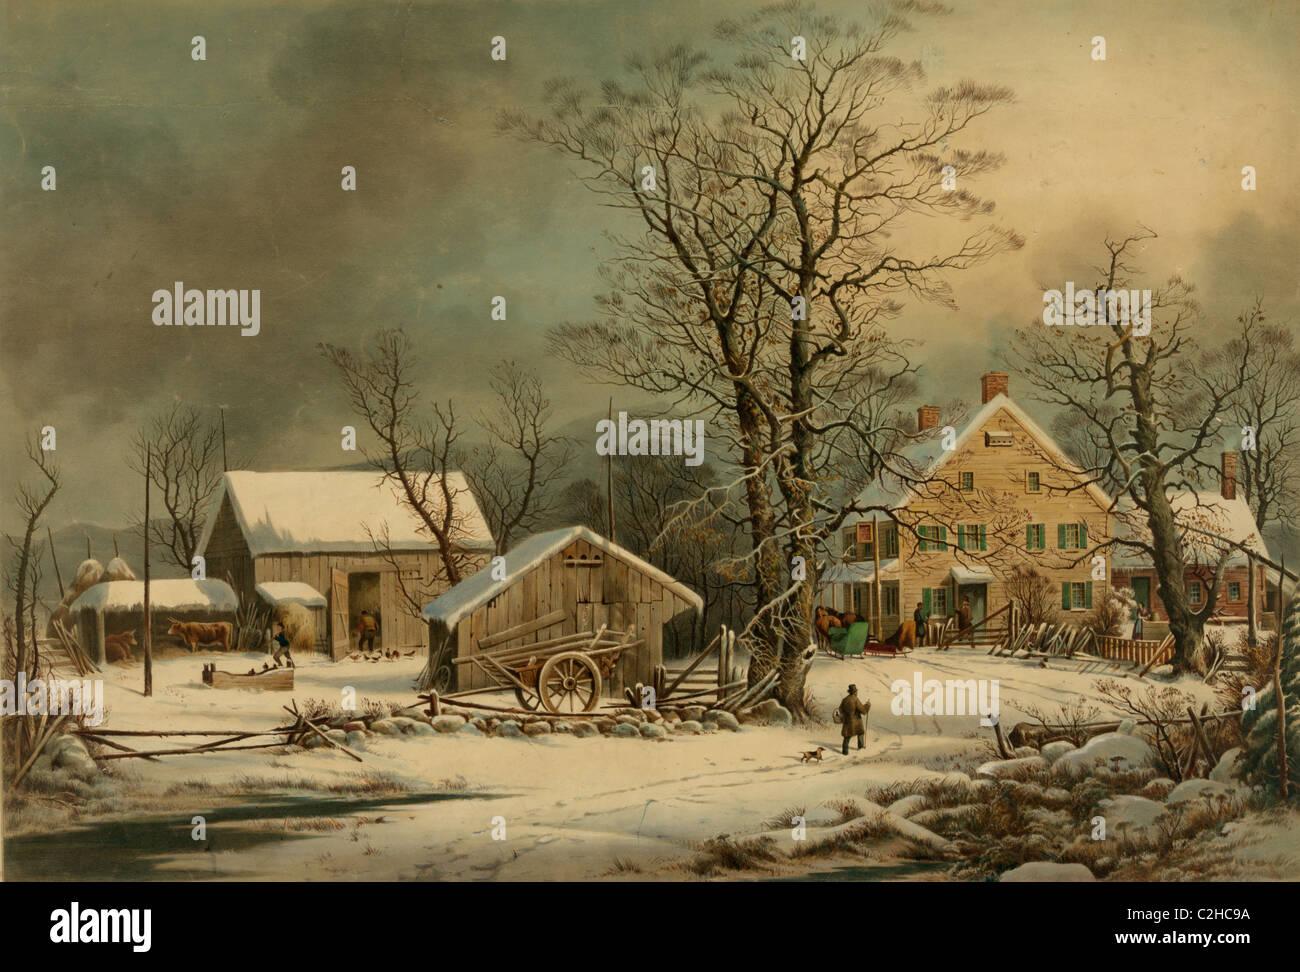 Winter im Land; Ein kalter Morgen Stockbild